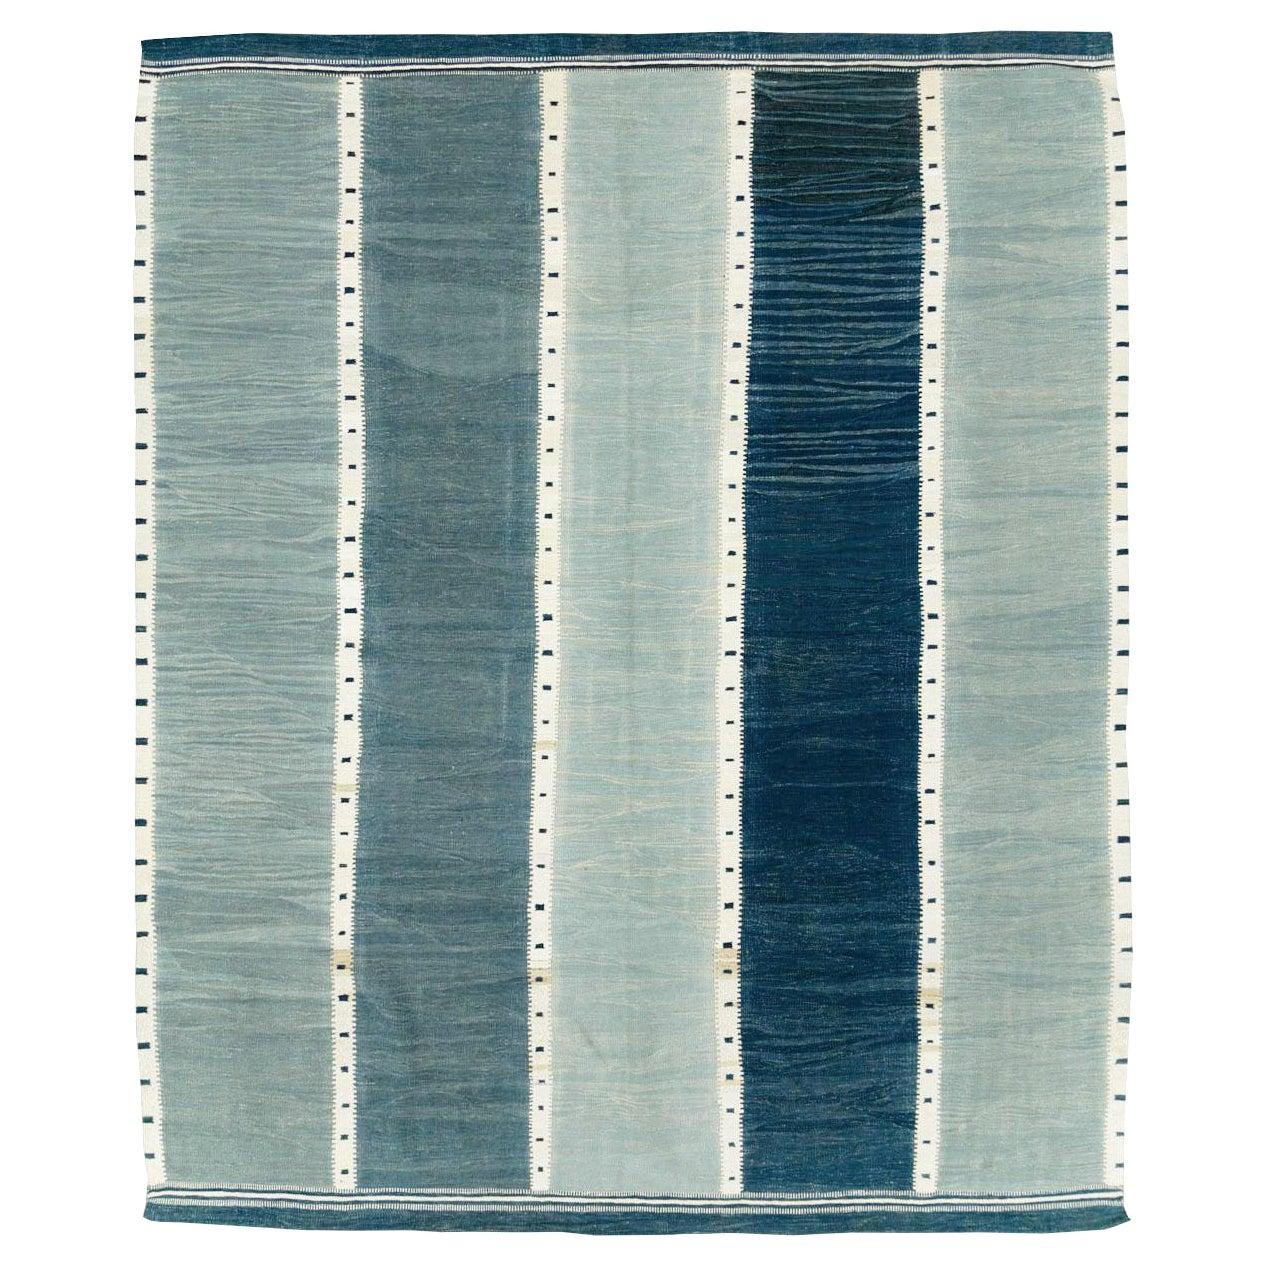 Swedish Inspired Contemporary Turkish Flat-Weave Kilim Small Room Size Carpet